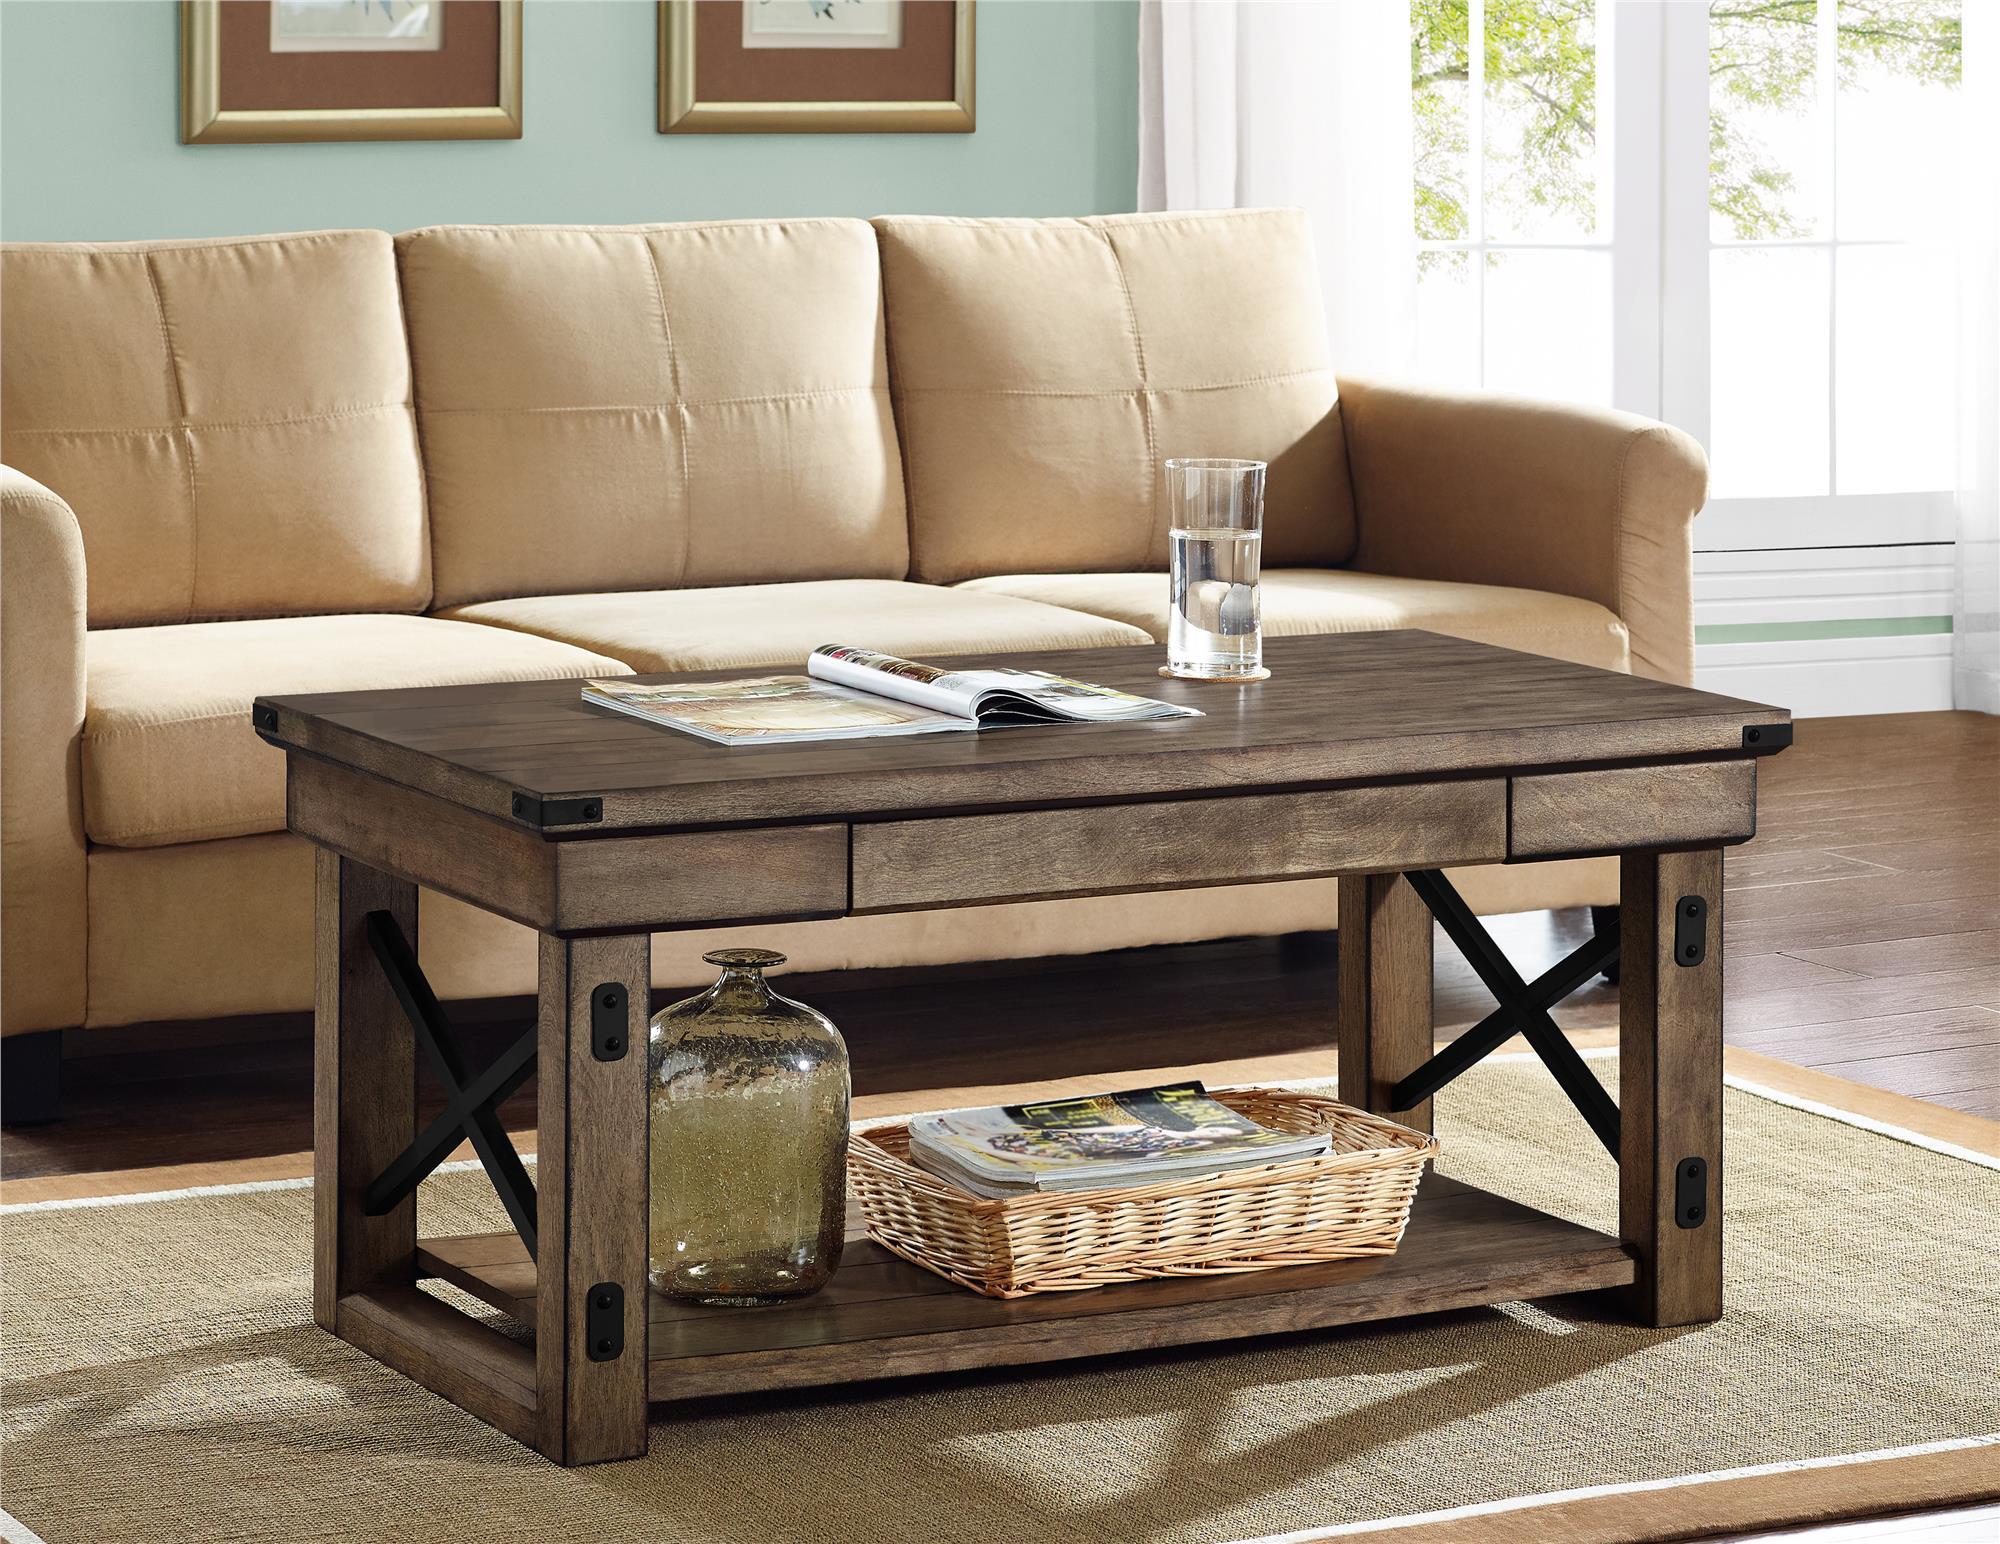 Dorel Wildwood Rustic Gray Coffee Table